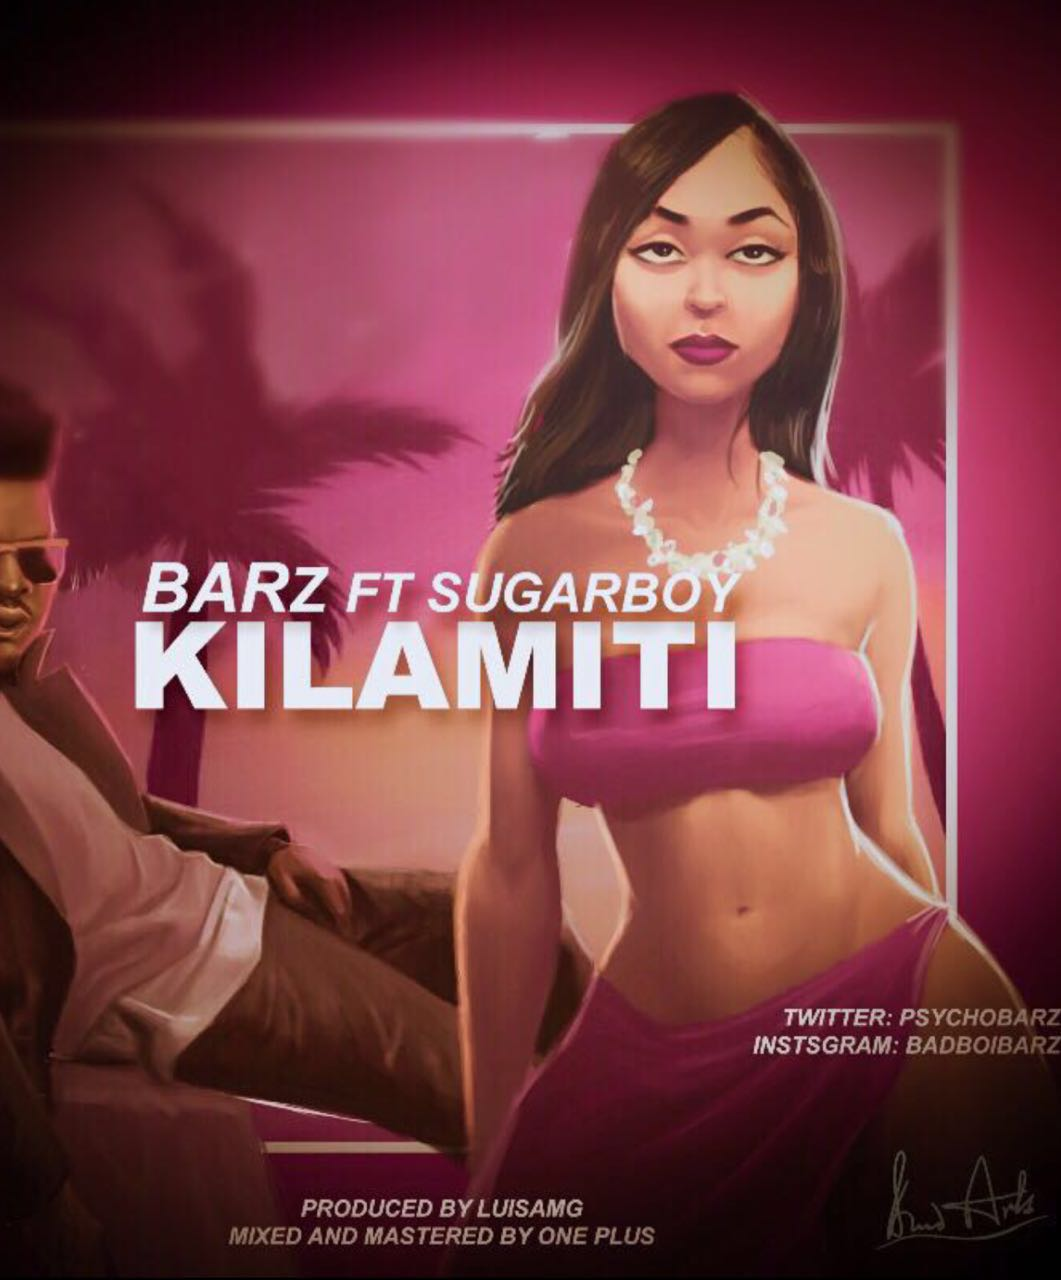 Barz ft. SugarBoy – Kilamiti